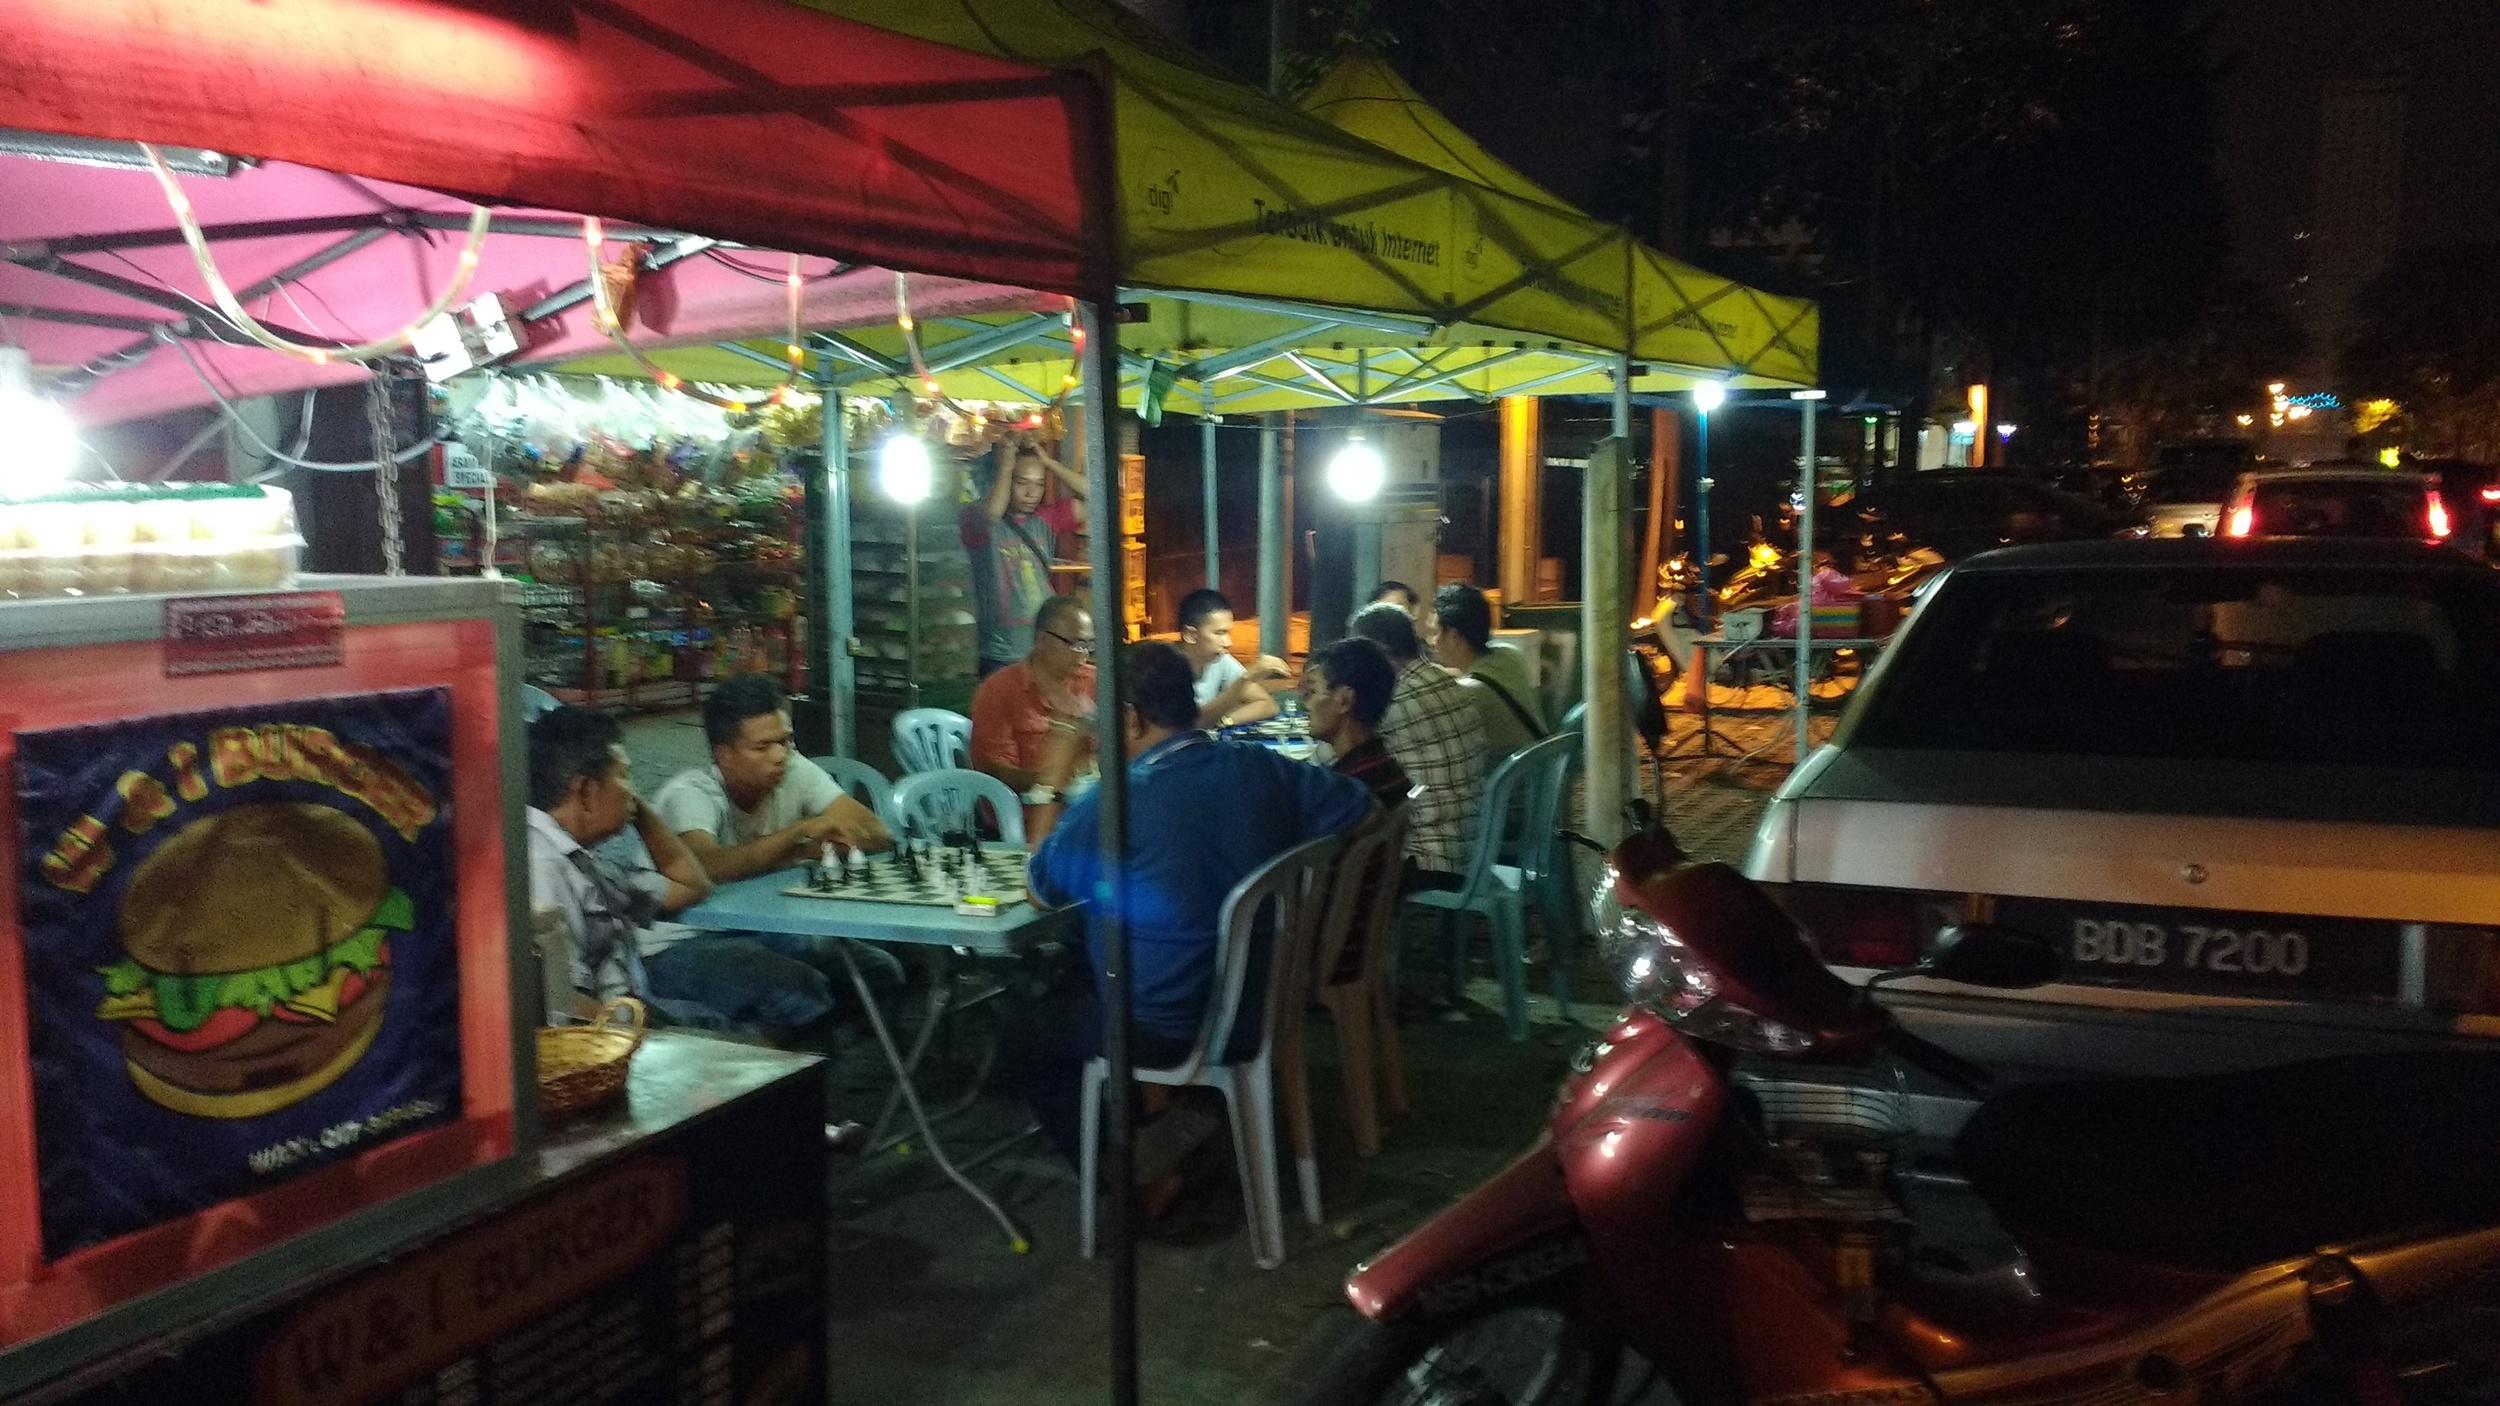 Residents join in for a street-side game of chess on Jalan Raja Alang, Kampung Bharu. Photo: Vishnu Prasad